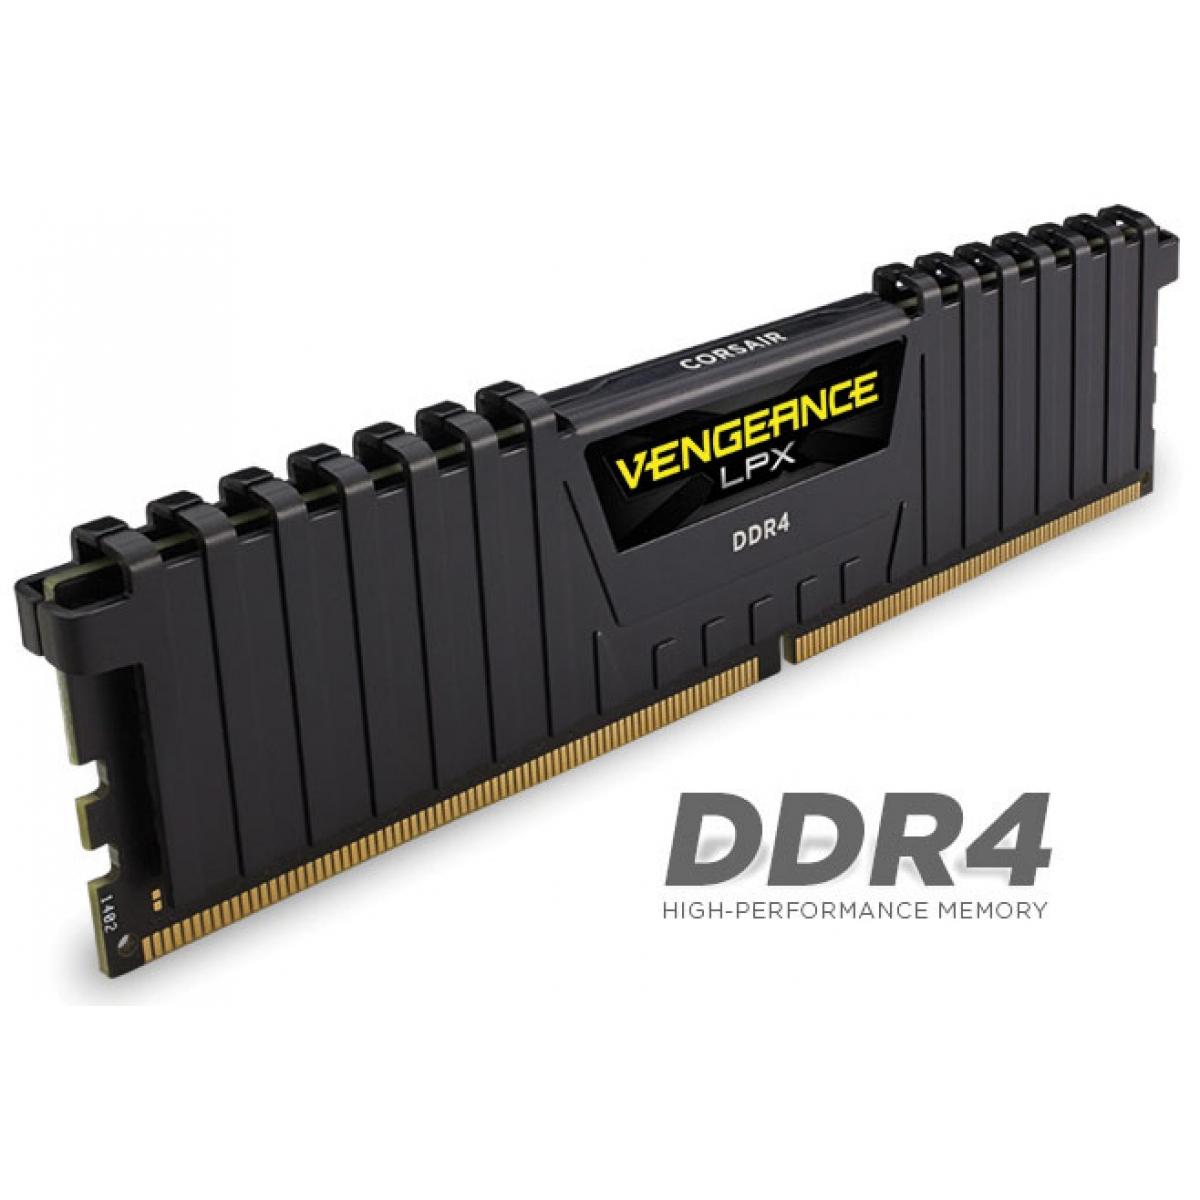 Memória DDR4 Corsair Vengeance LPX, 16GB 3000MHz, Black, CMK16GX4M1B3000C15